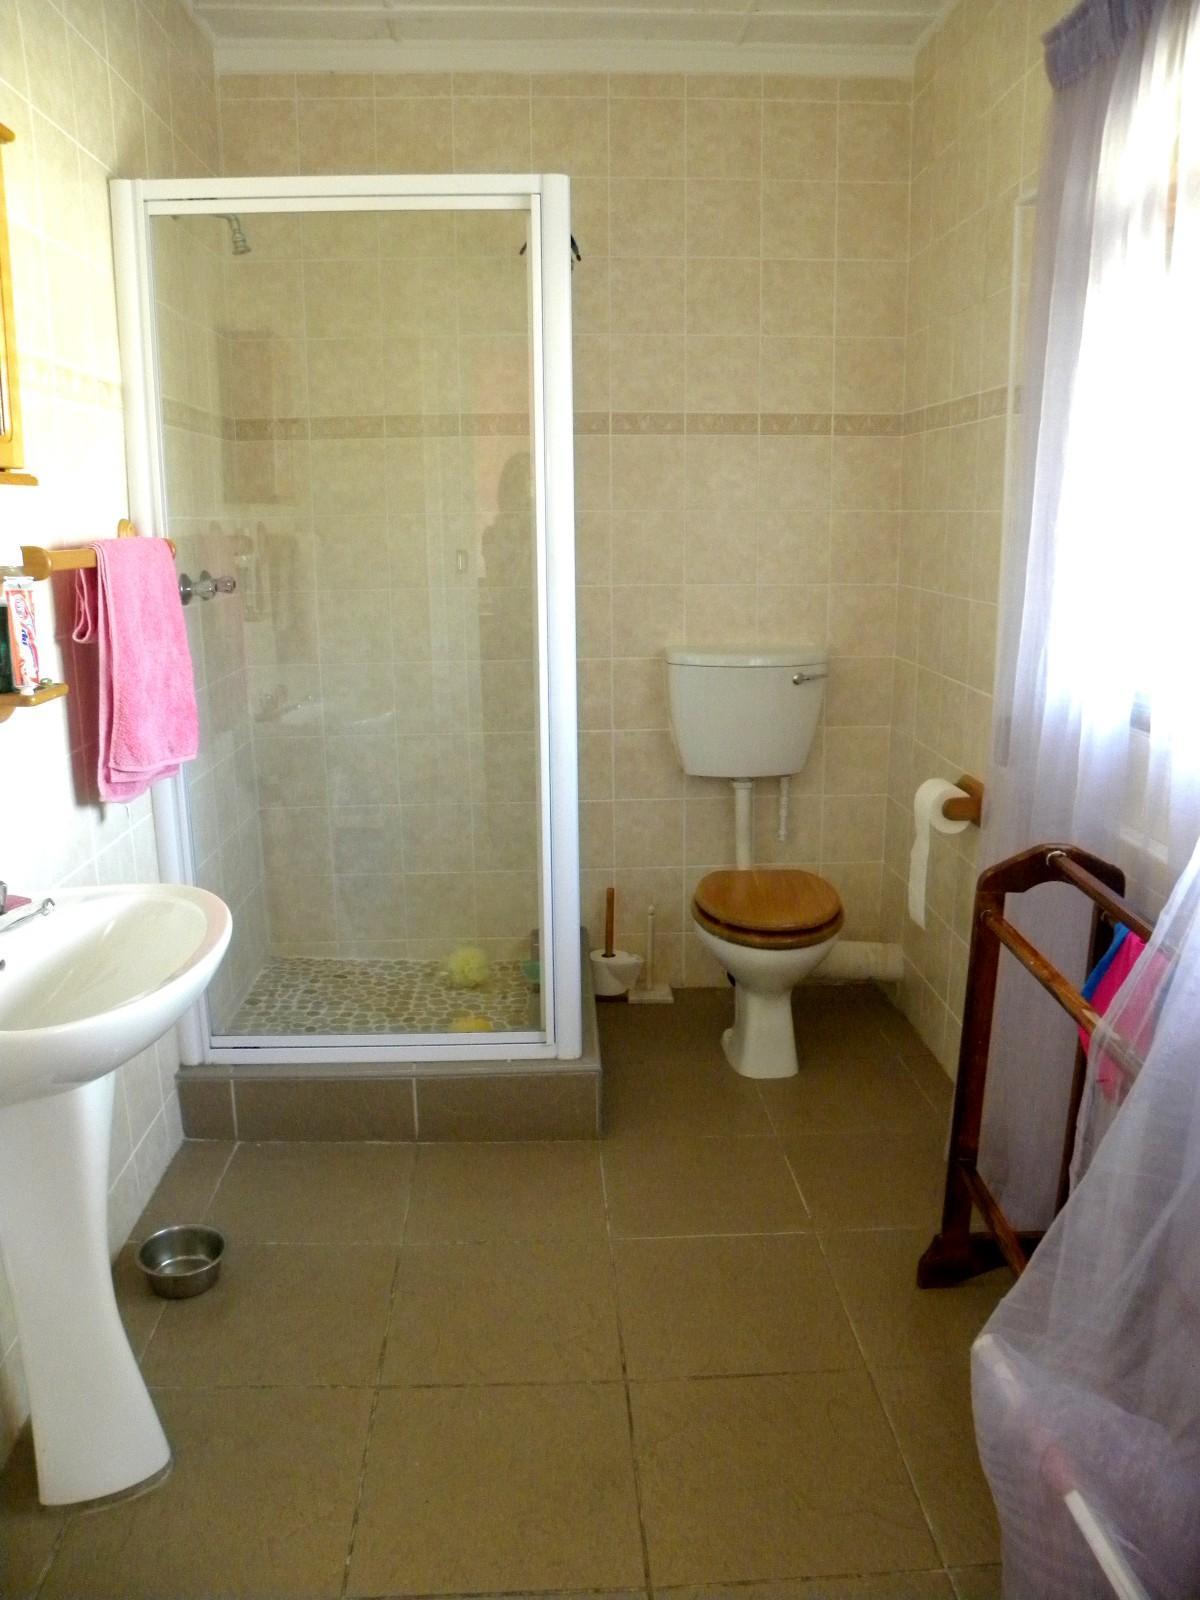 Bonnie Doone property for sale. Ref No: 13229687. Picture no 16